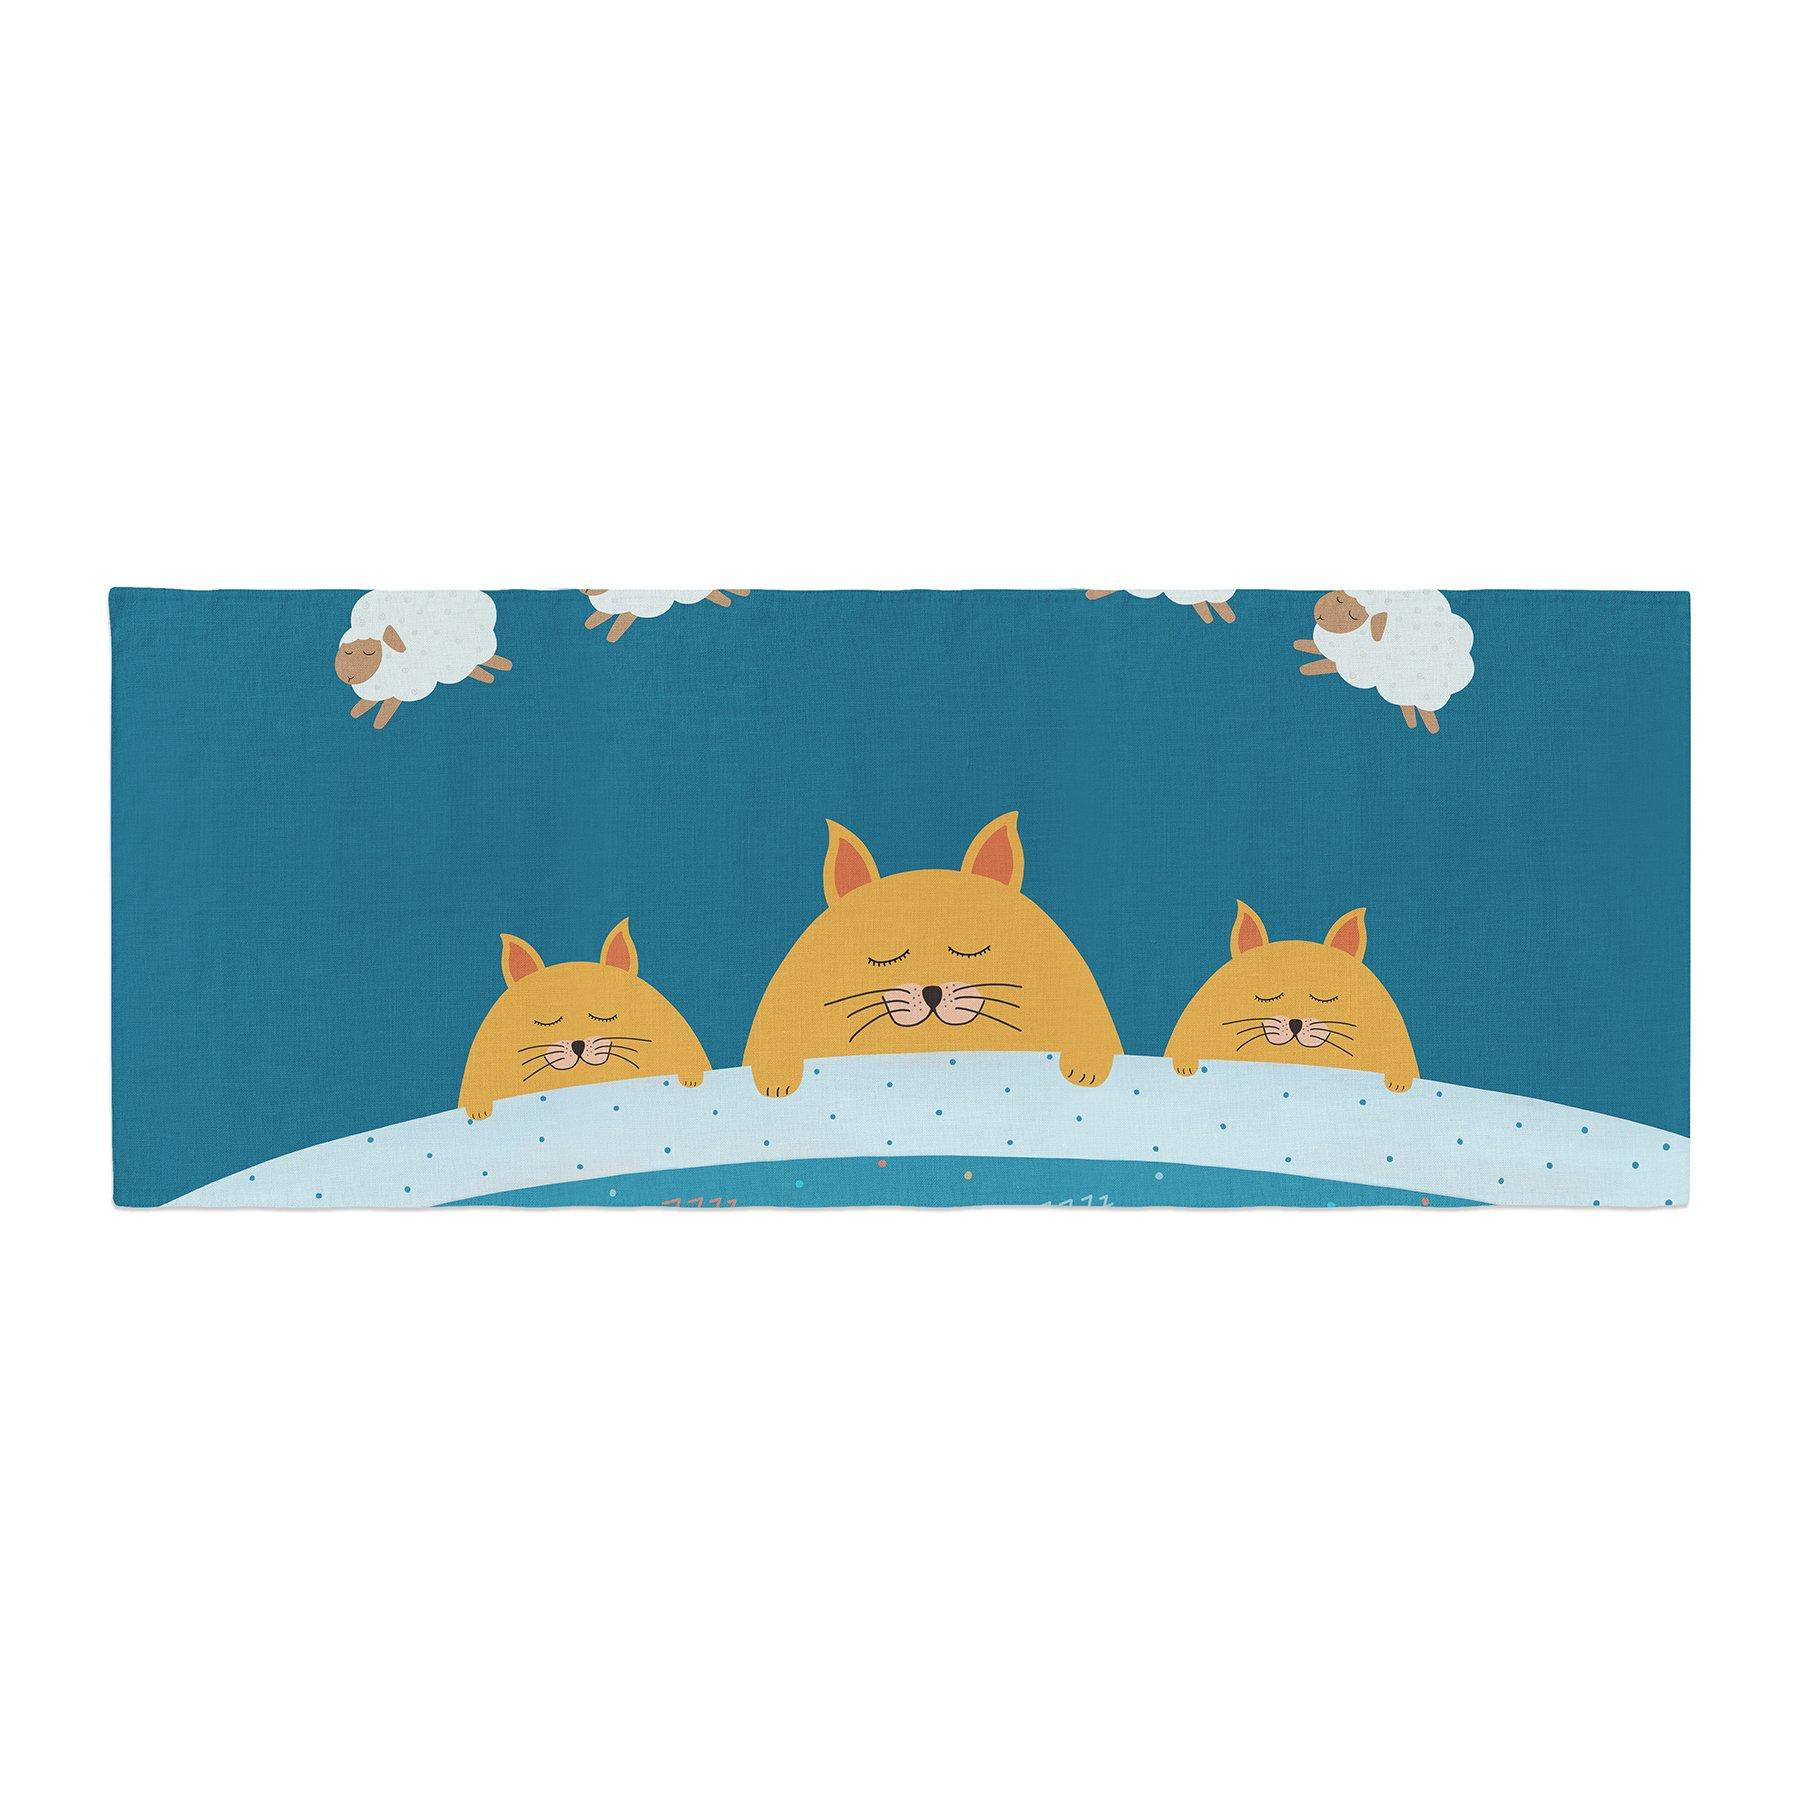 Kess InHouse Cristina bianco Design Sleeping Cats Zzzz Teal Animals Bed Runner, 34'' x 86''